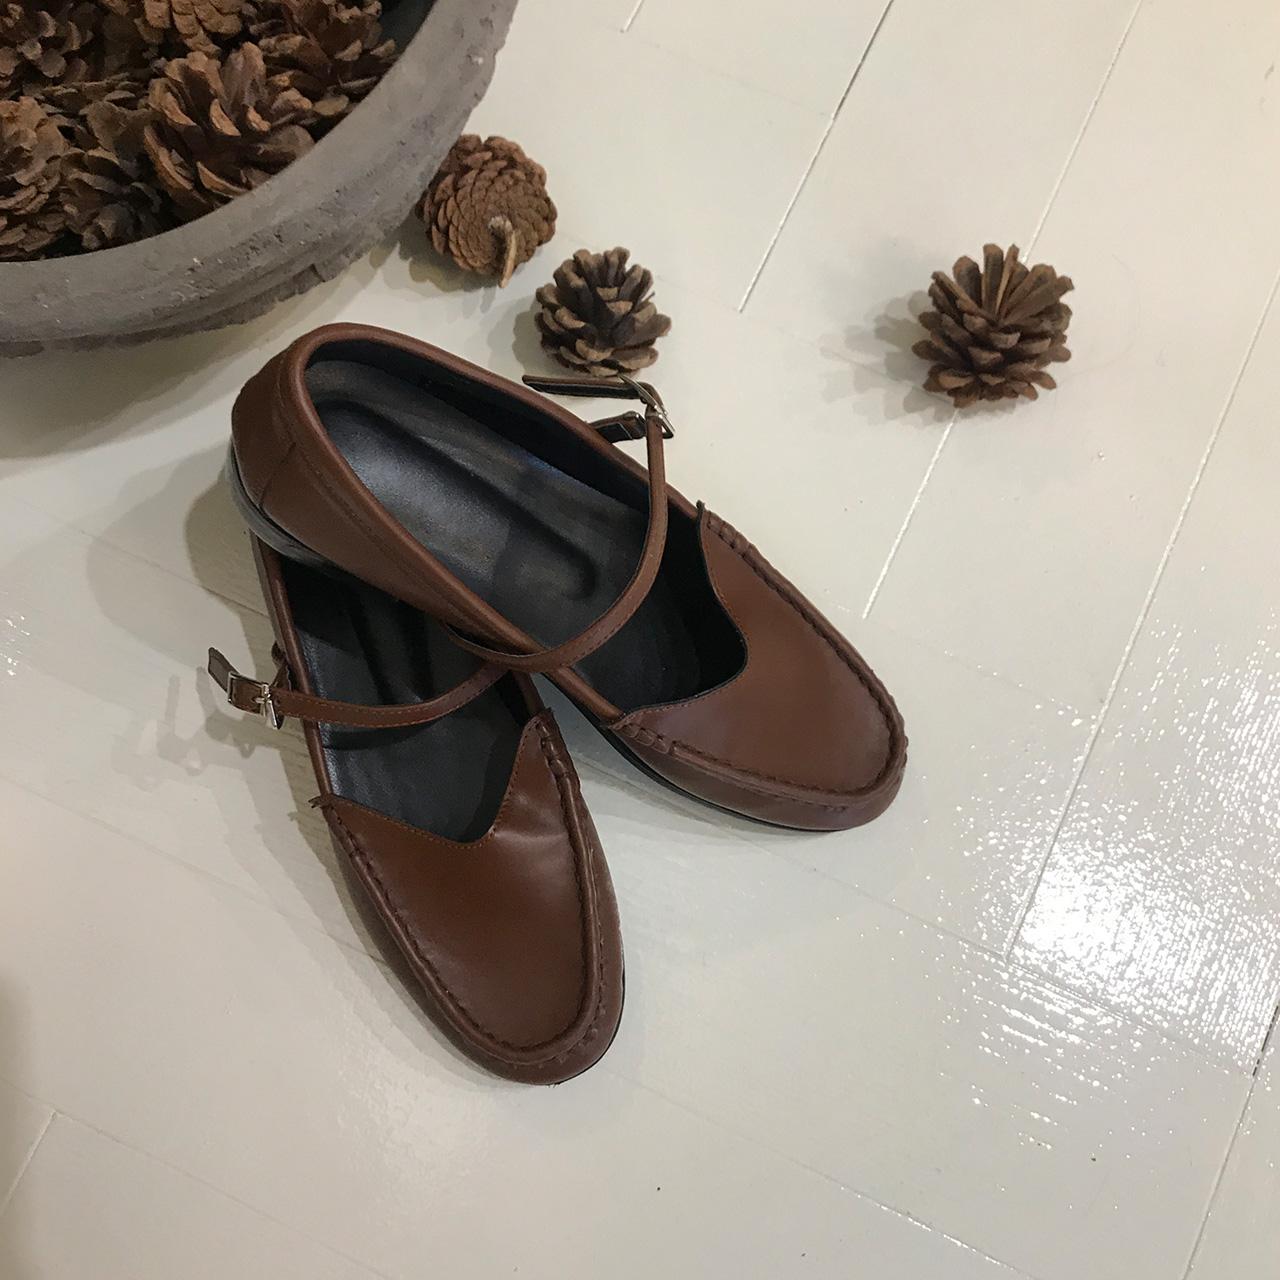 Classic strap shoes